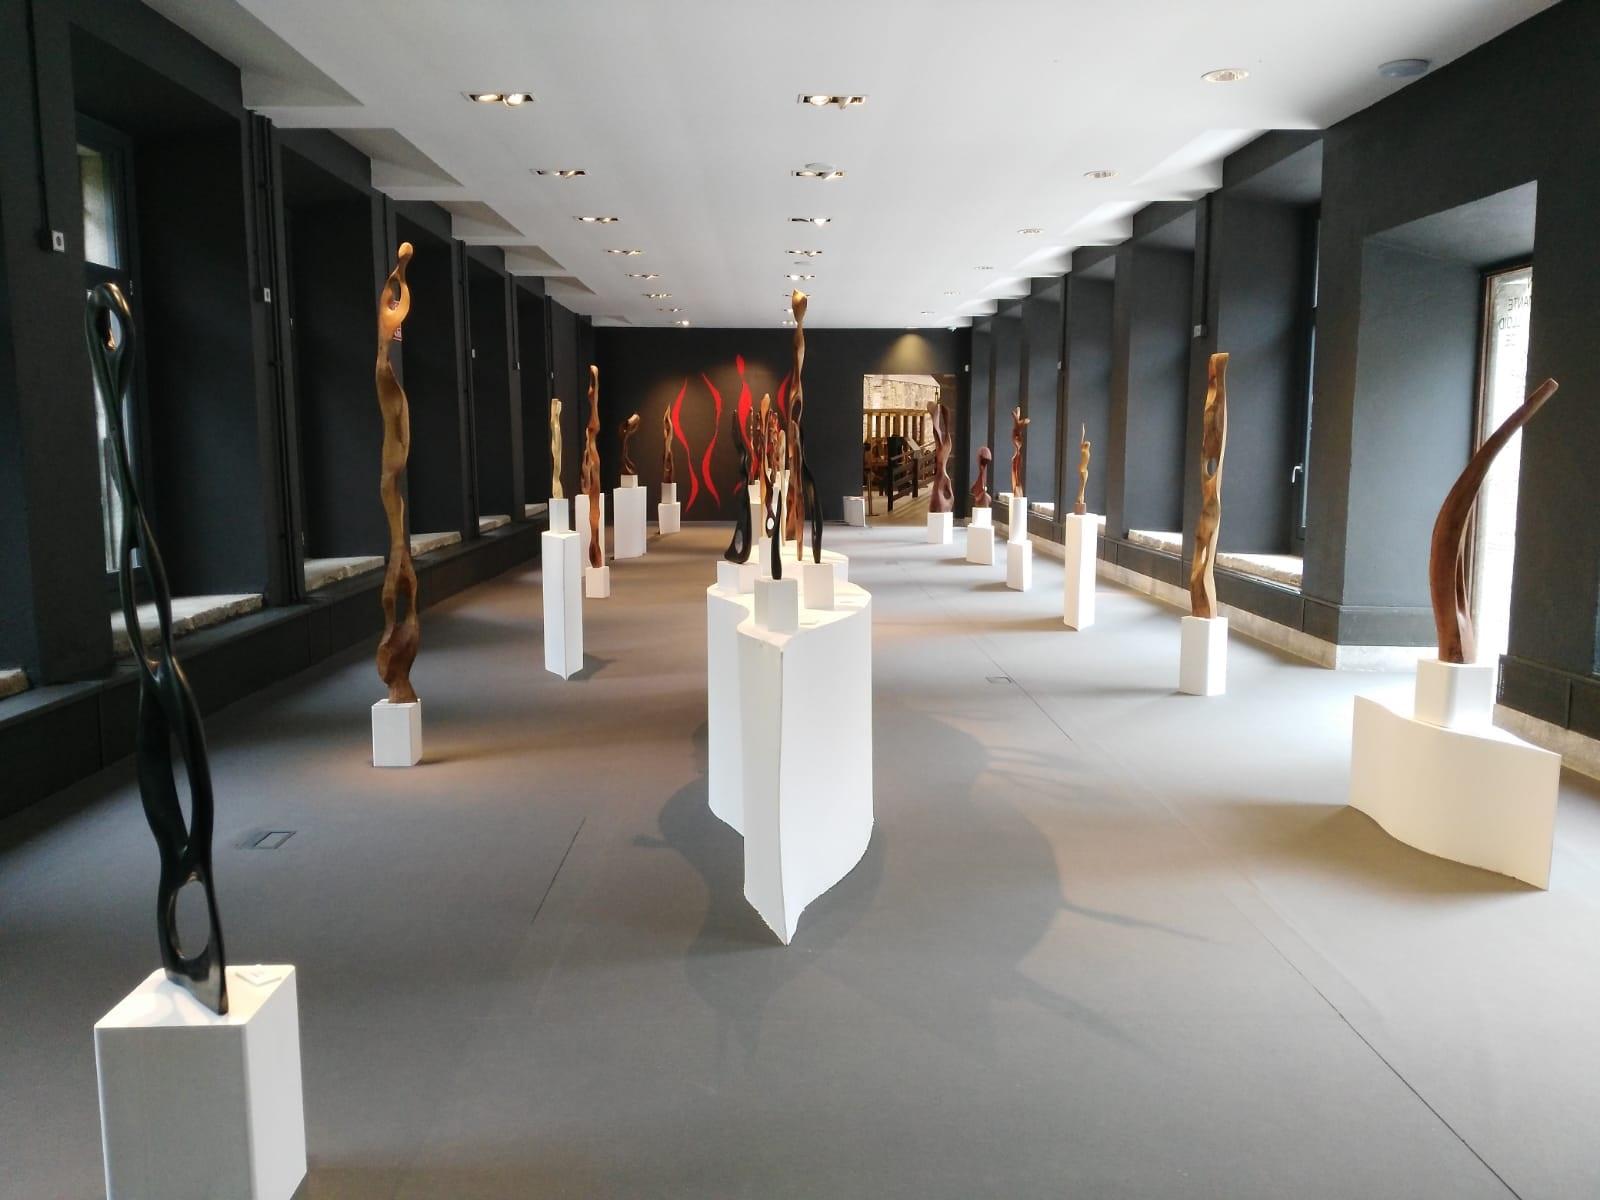 3-Federico_Osorio_Esposicion_Corrientes_Real_Casa_Moneda_Segovia